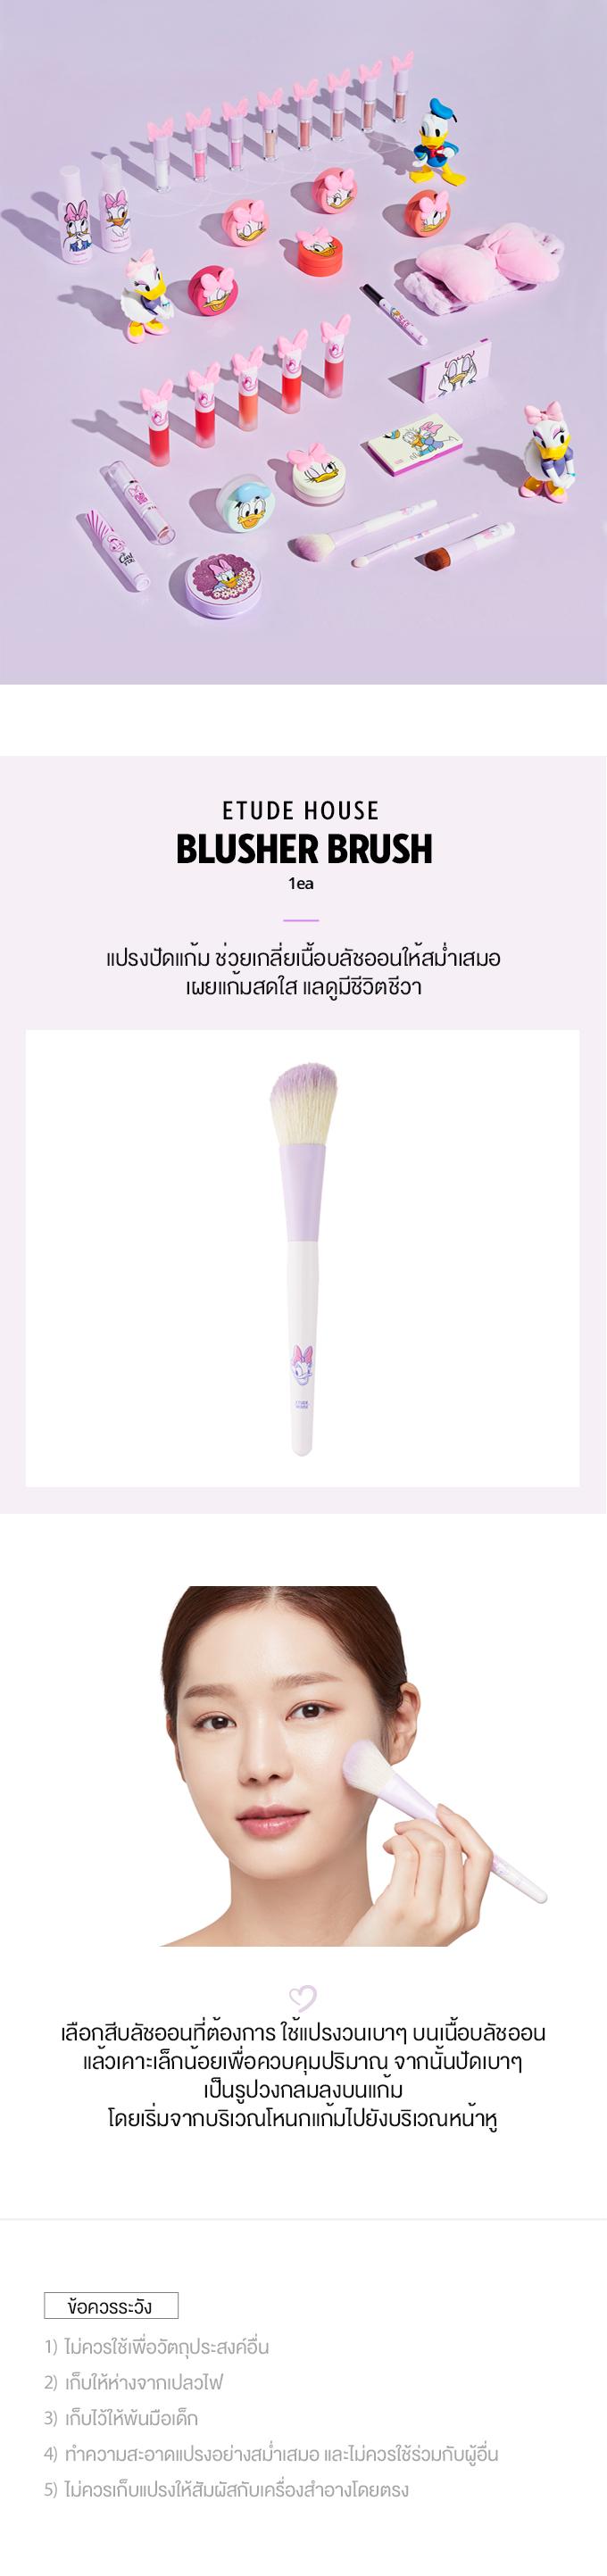 TH1_(Daisy Duck) Blusher Brush